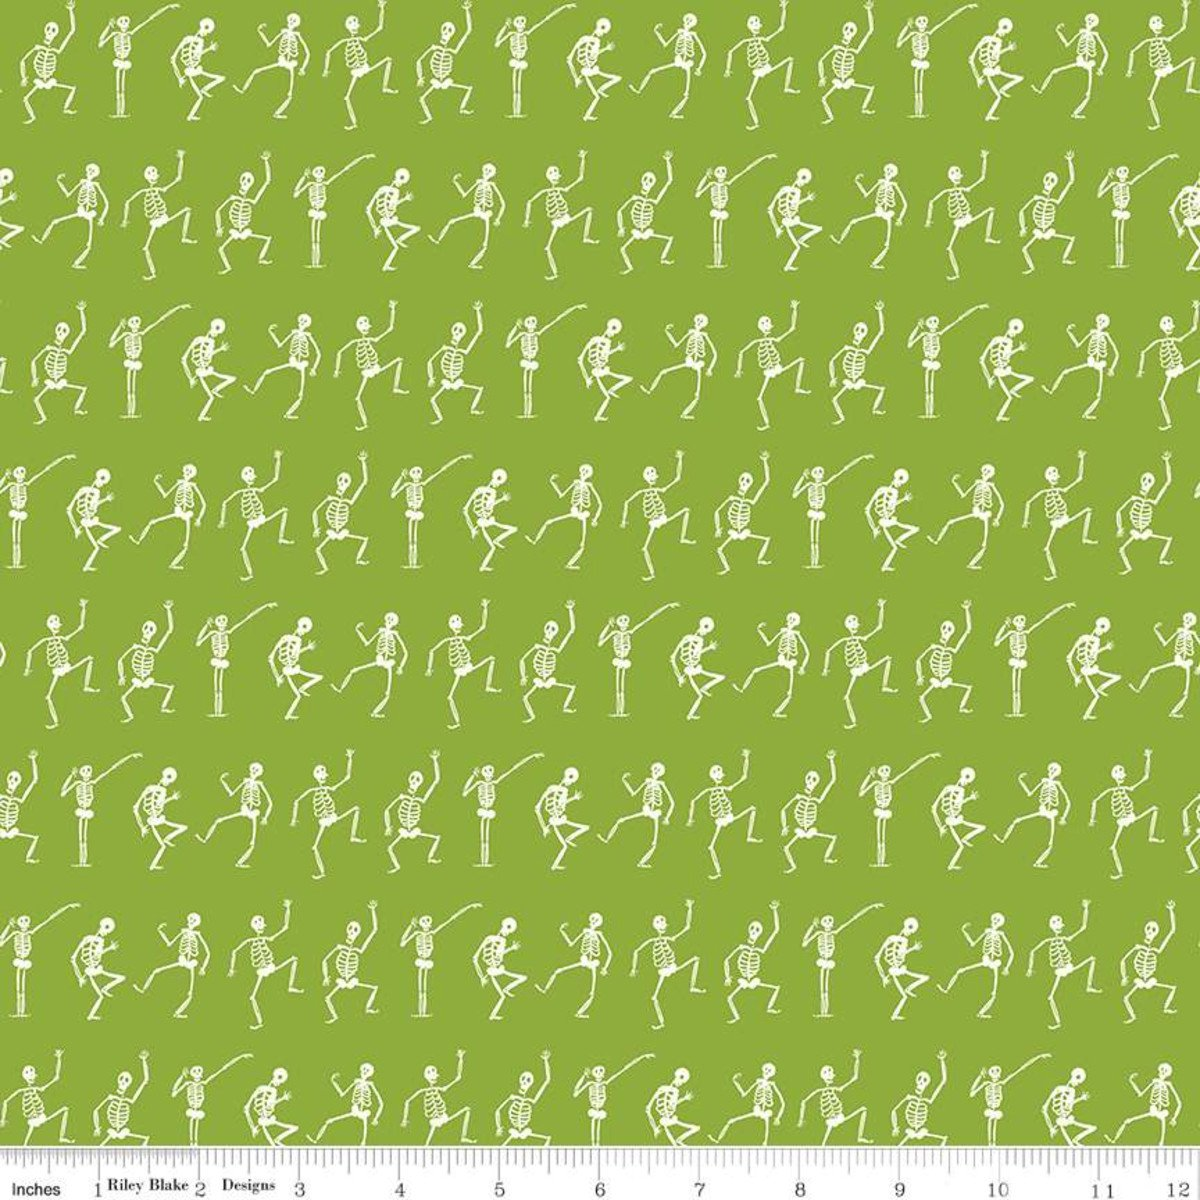 Hocus Pocus Skeletons Green C9494-GREEN